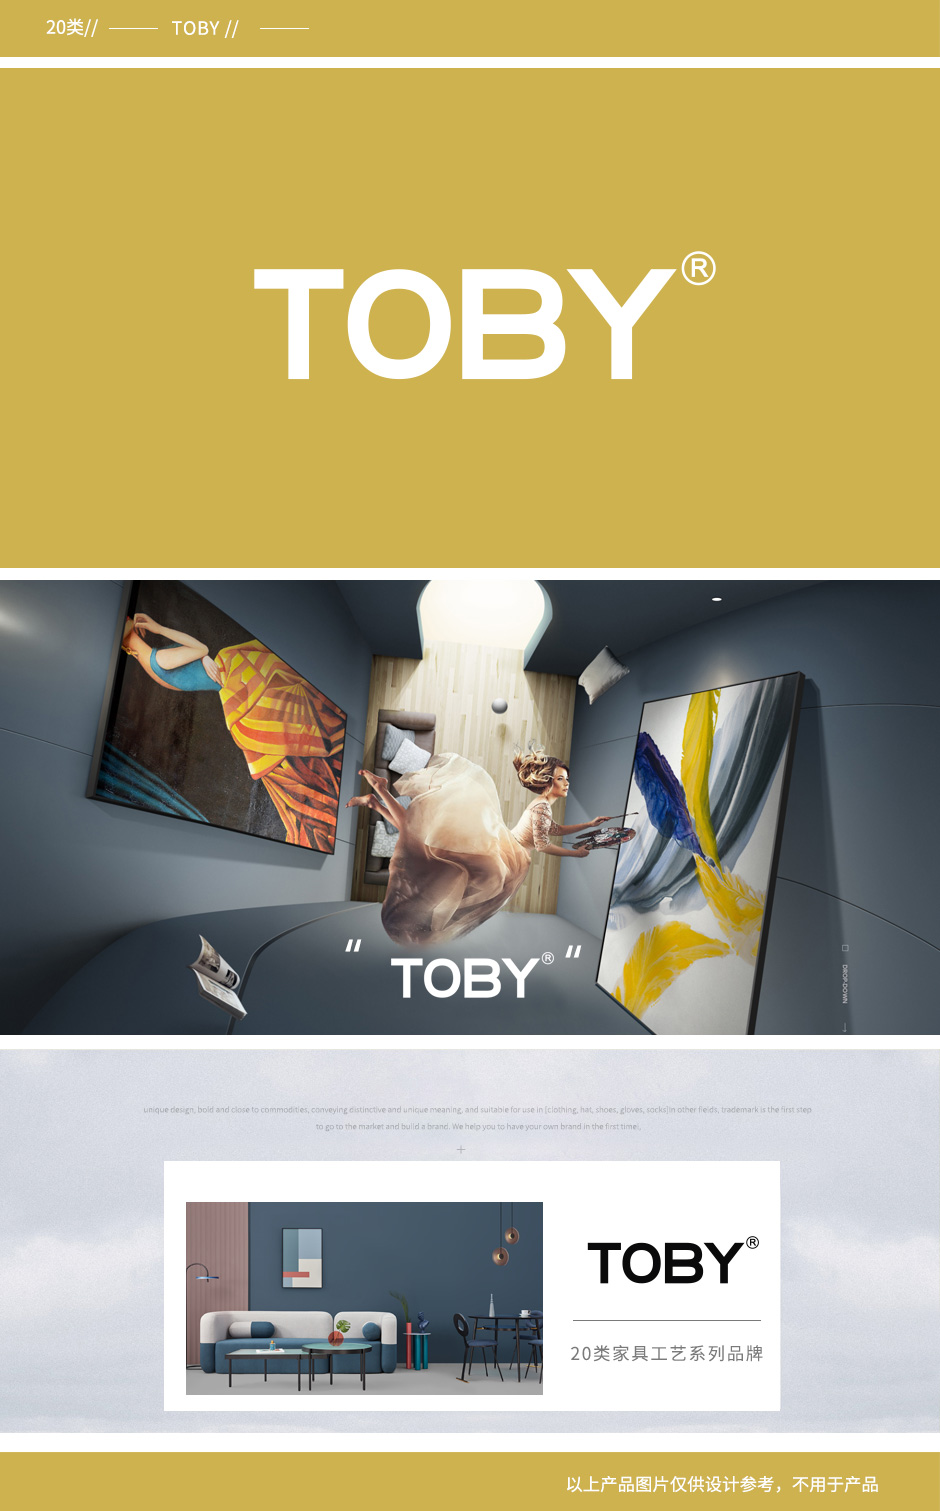 第20类-TOBY